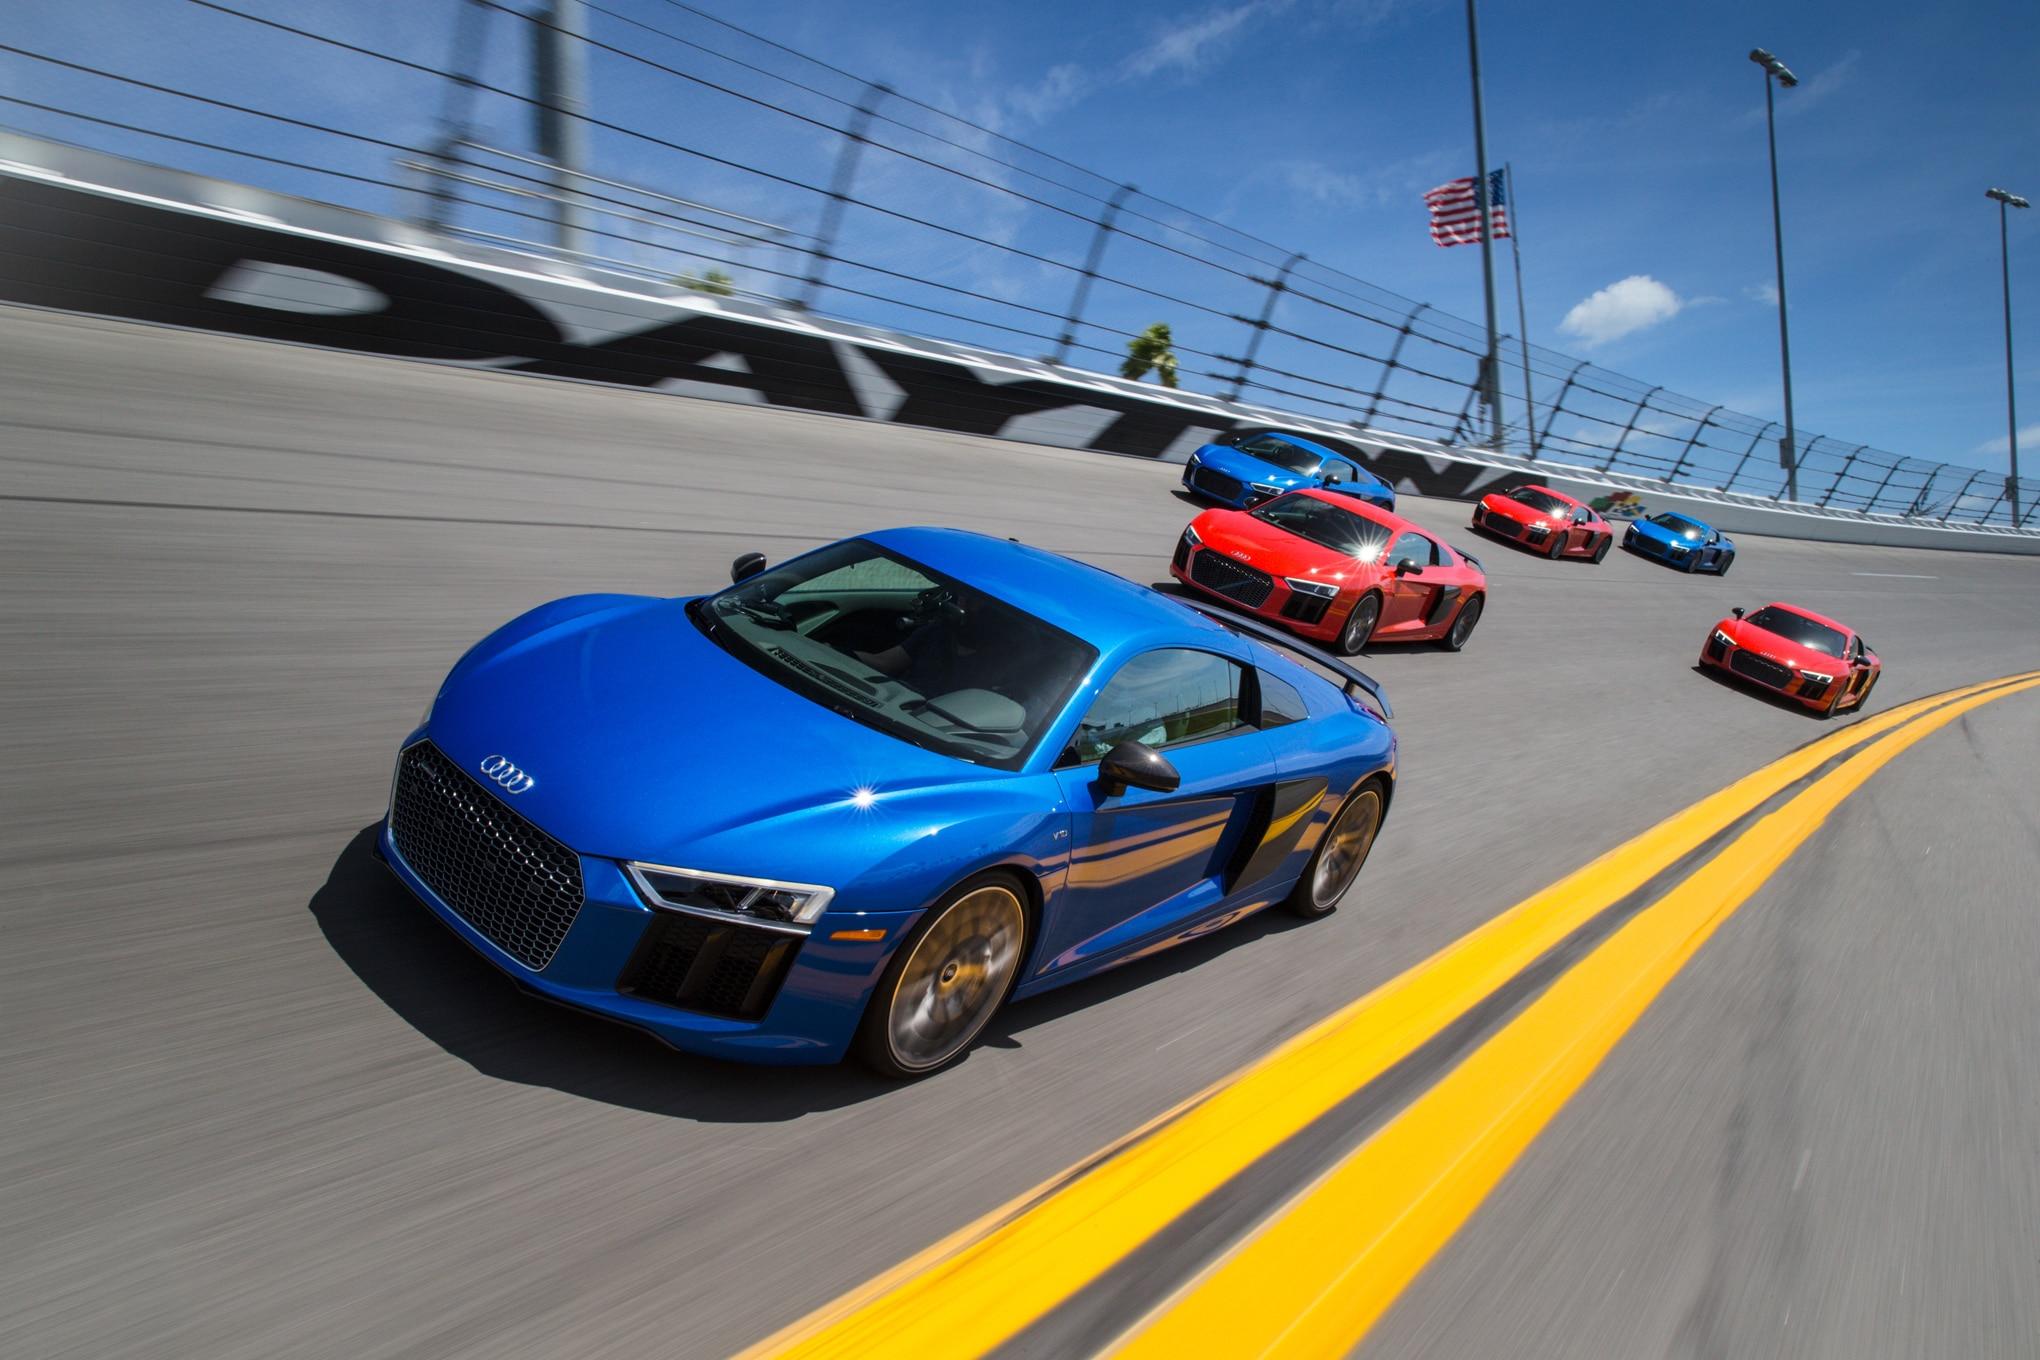 2017 Audi R8 V10 Plus Front Three Quarters Track 04